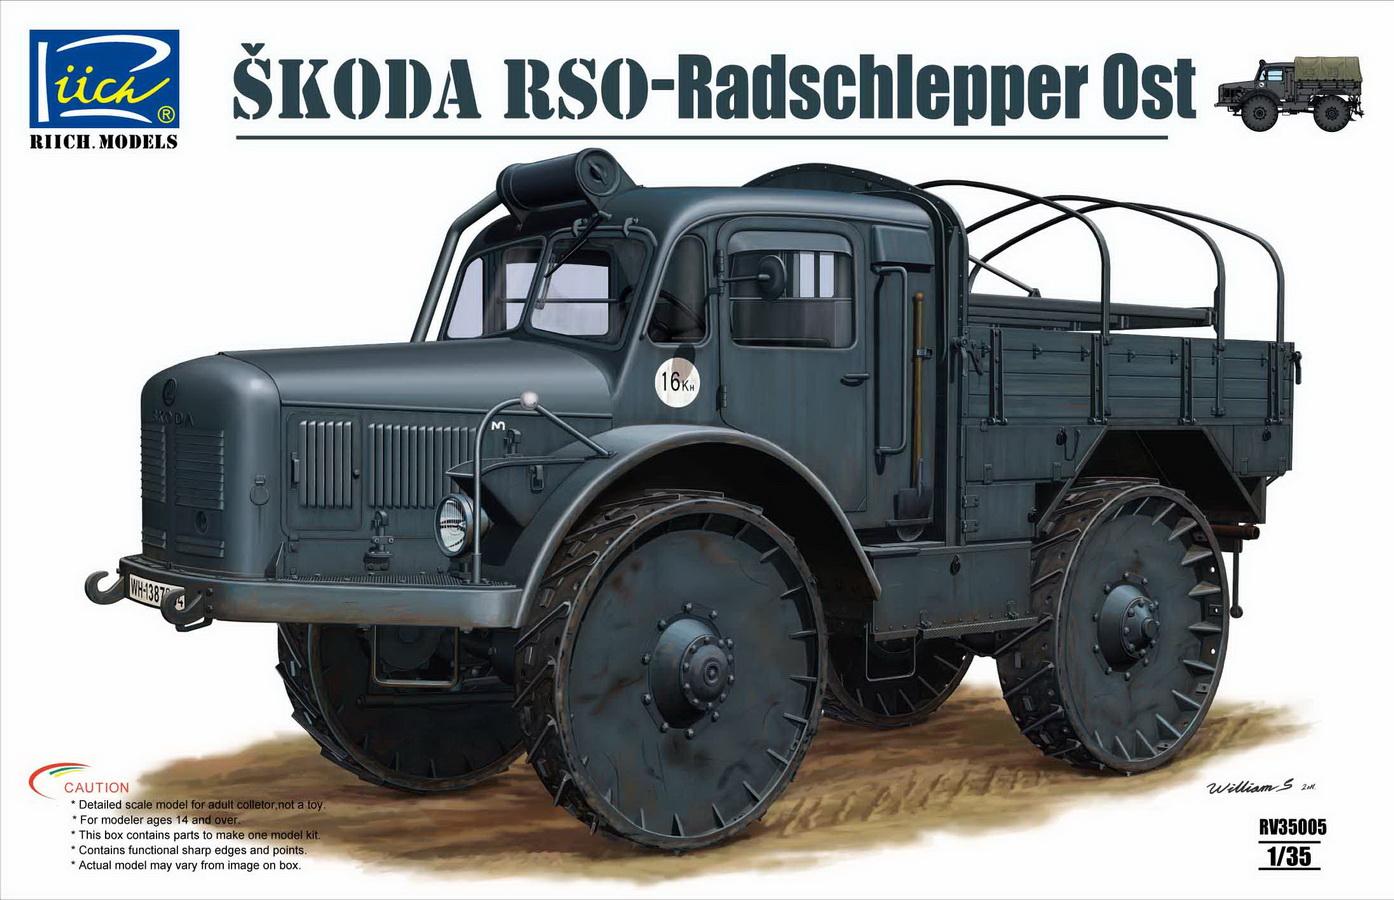 Riich 1/35 Skoda RSO-Radschlepper Ost